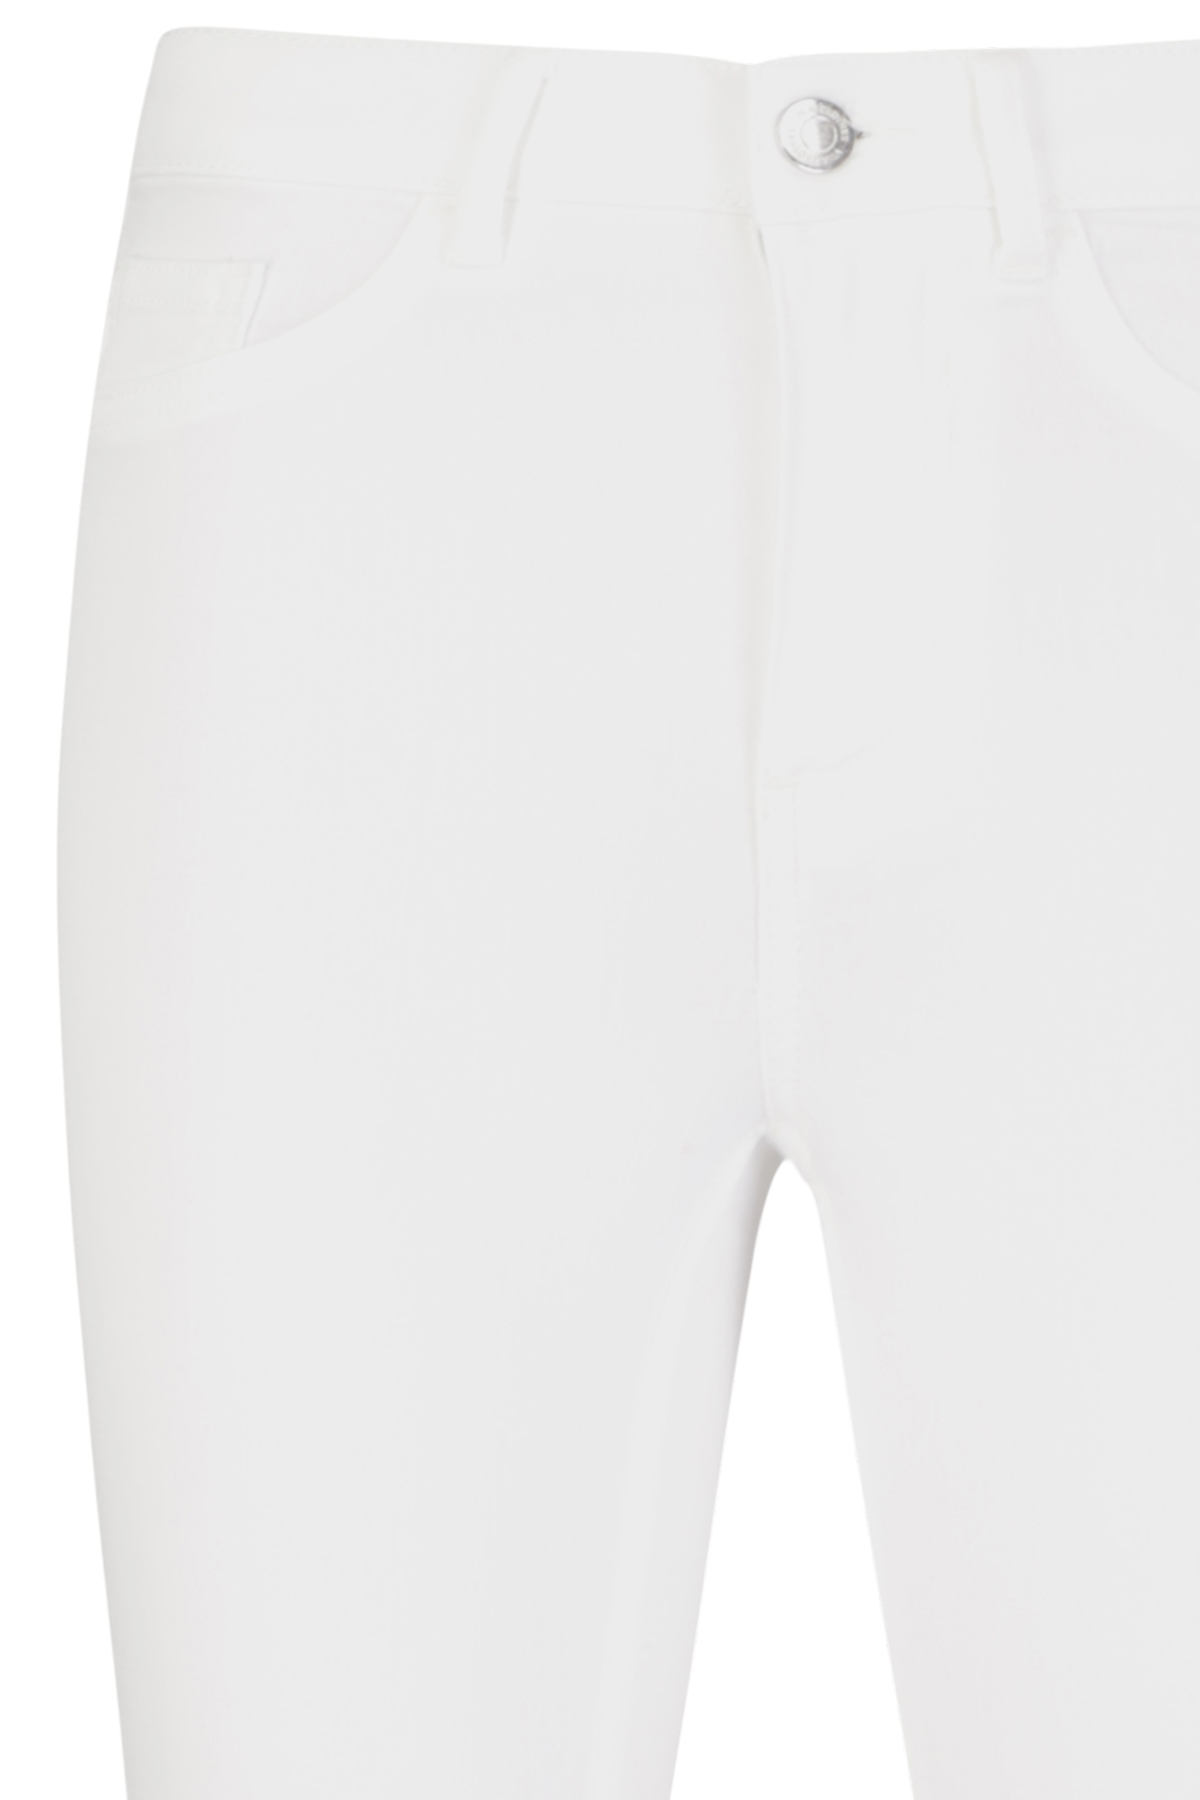 Vila Shirt - Top Ecru 14032799